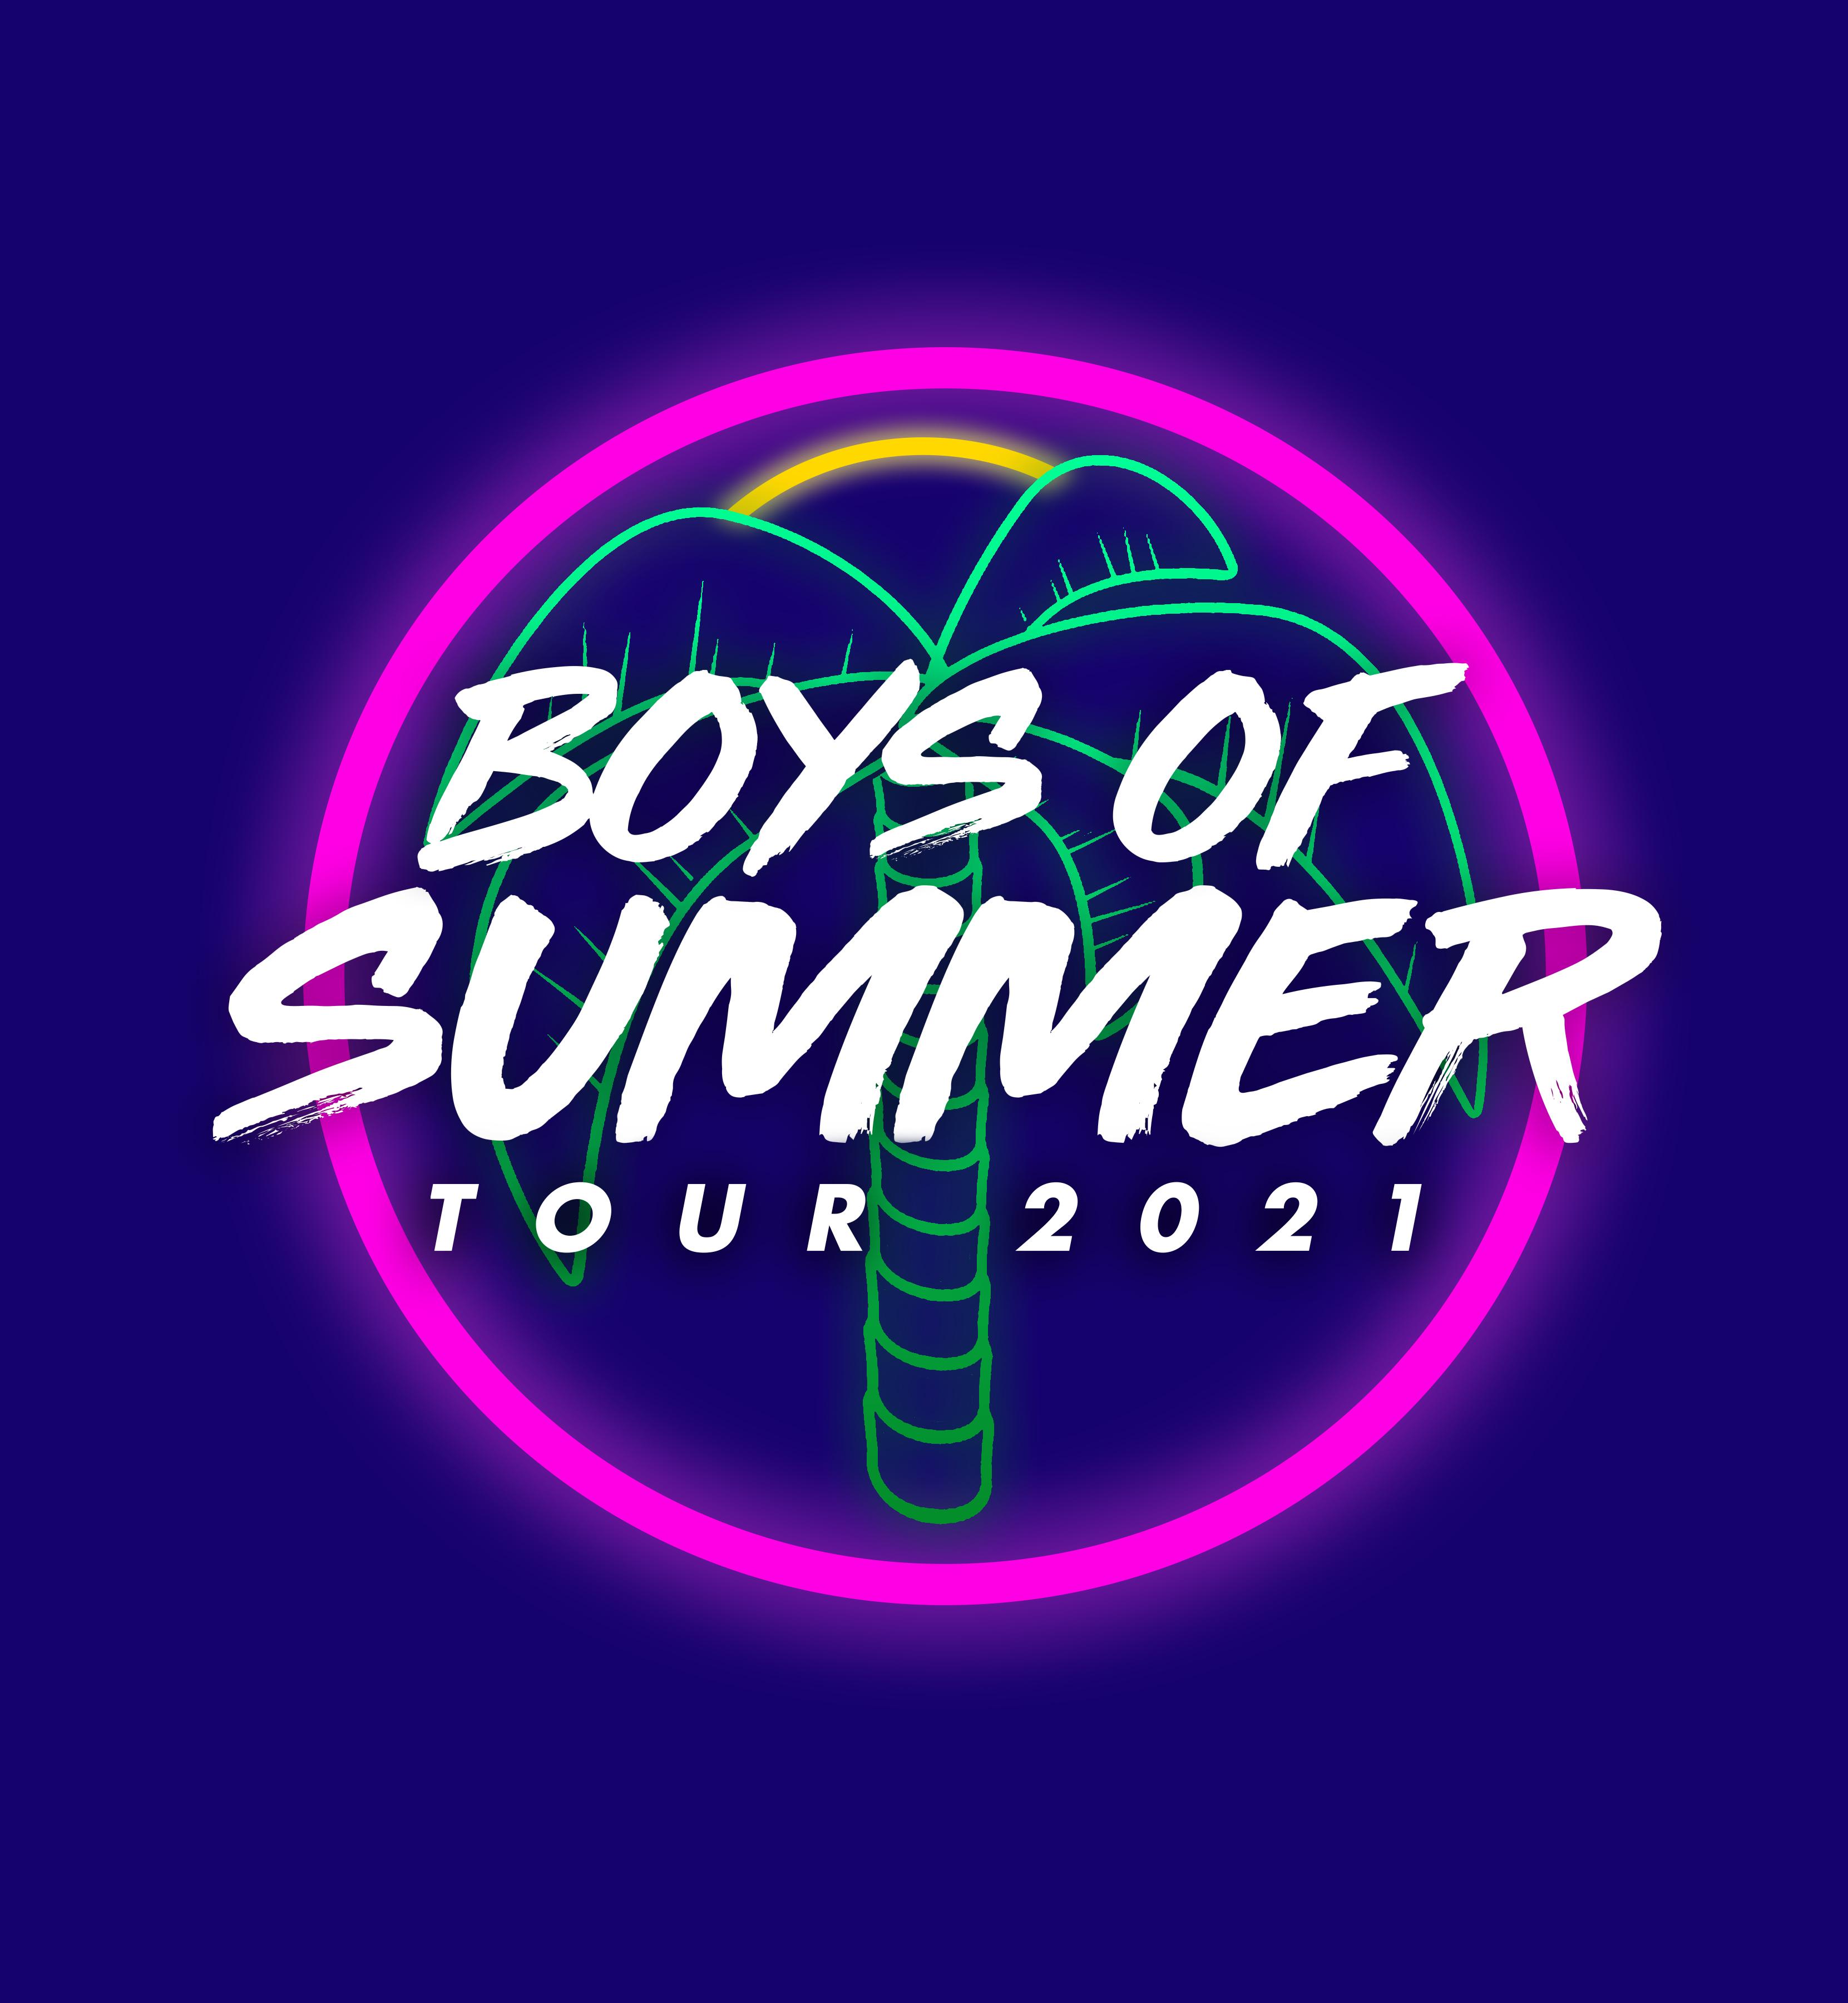 Boys Of Summer Tour 2021